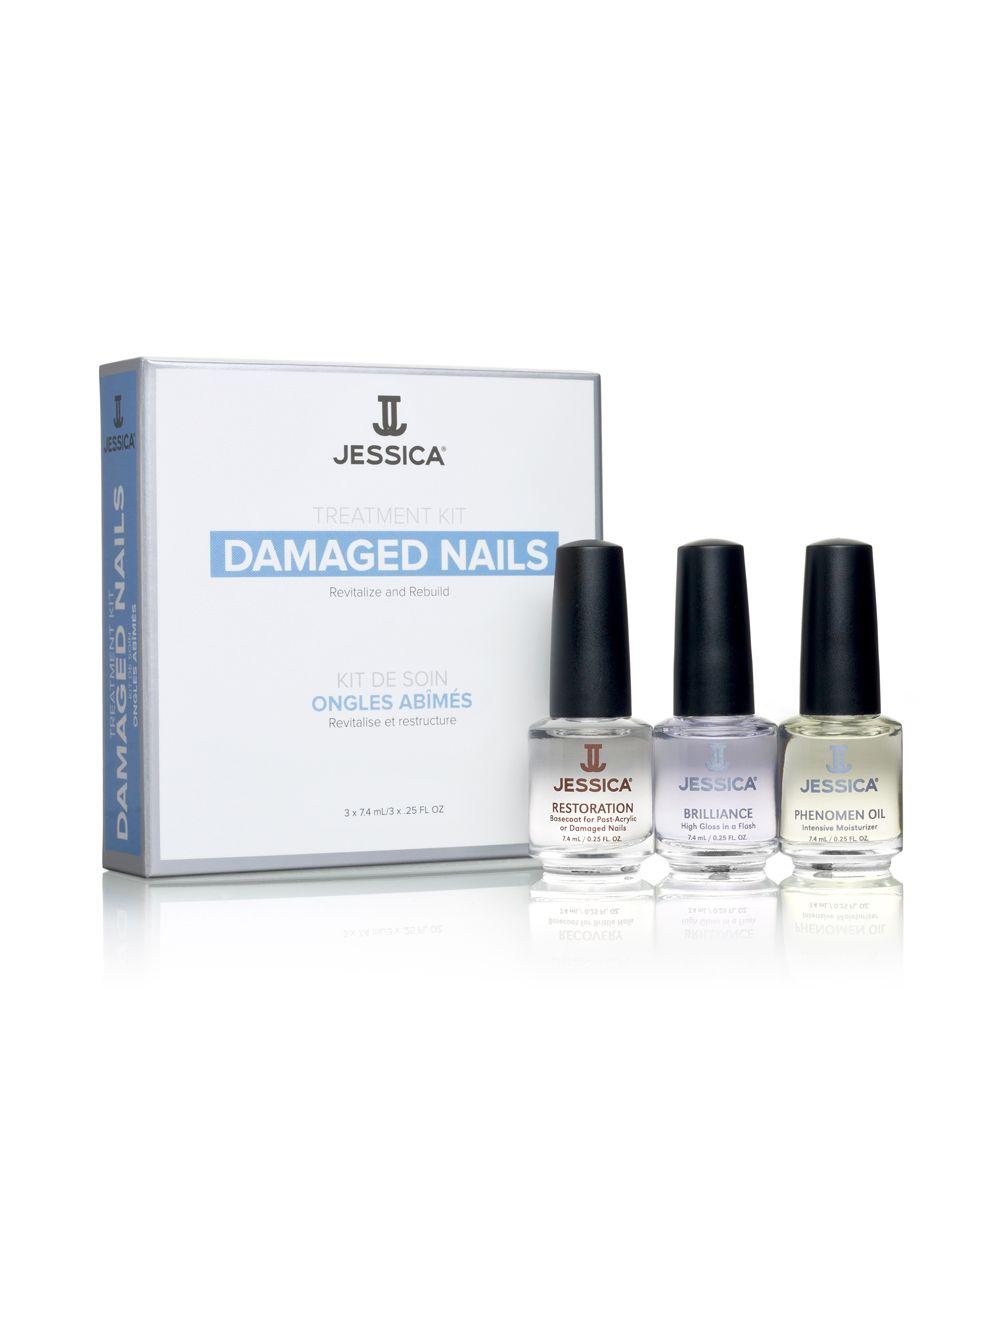 Damaged Nails Treatment Kit - Jessica Cosmetics